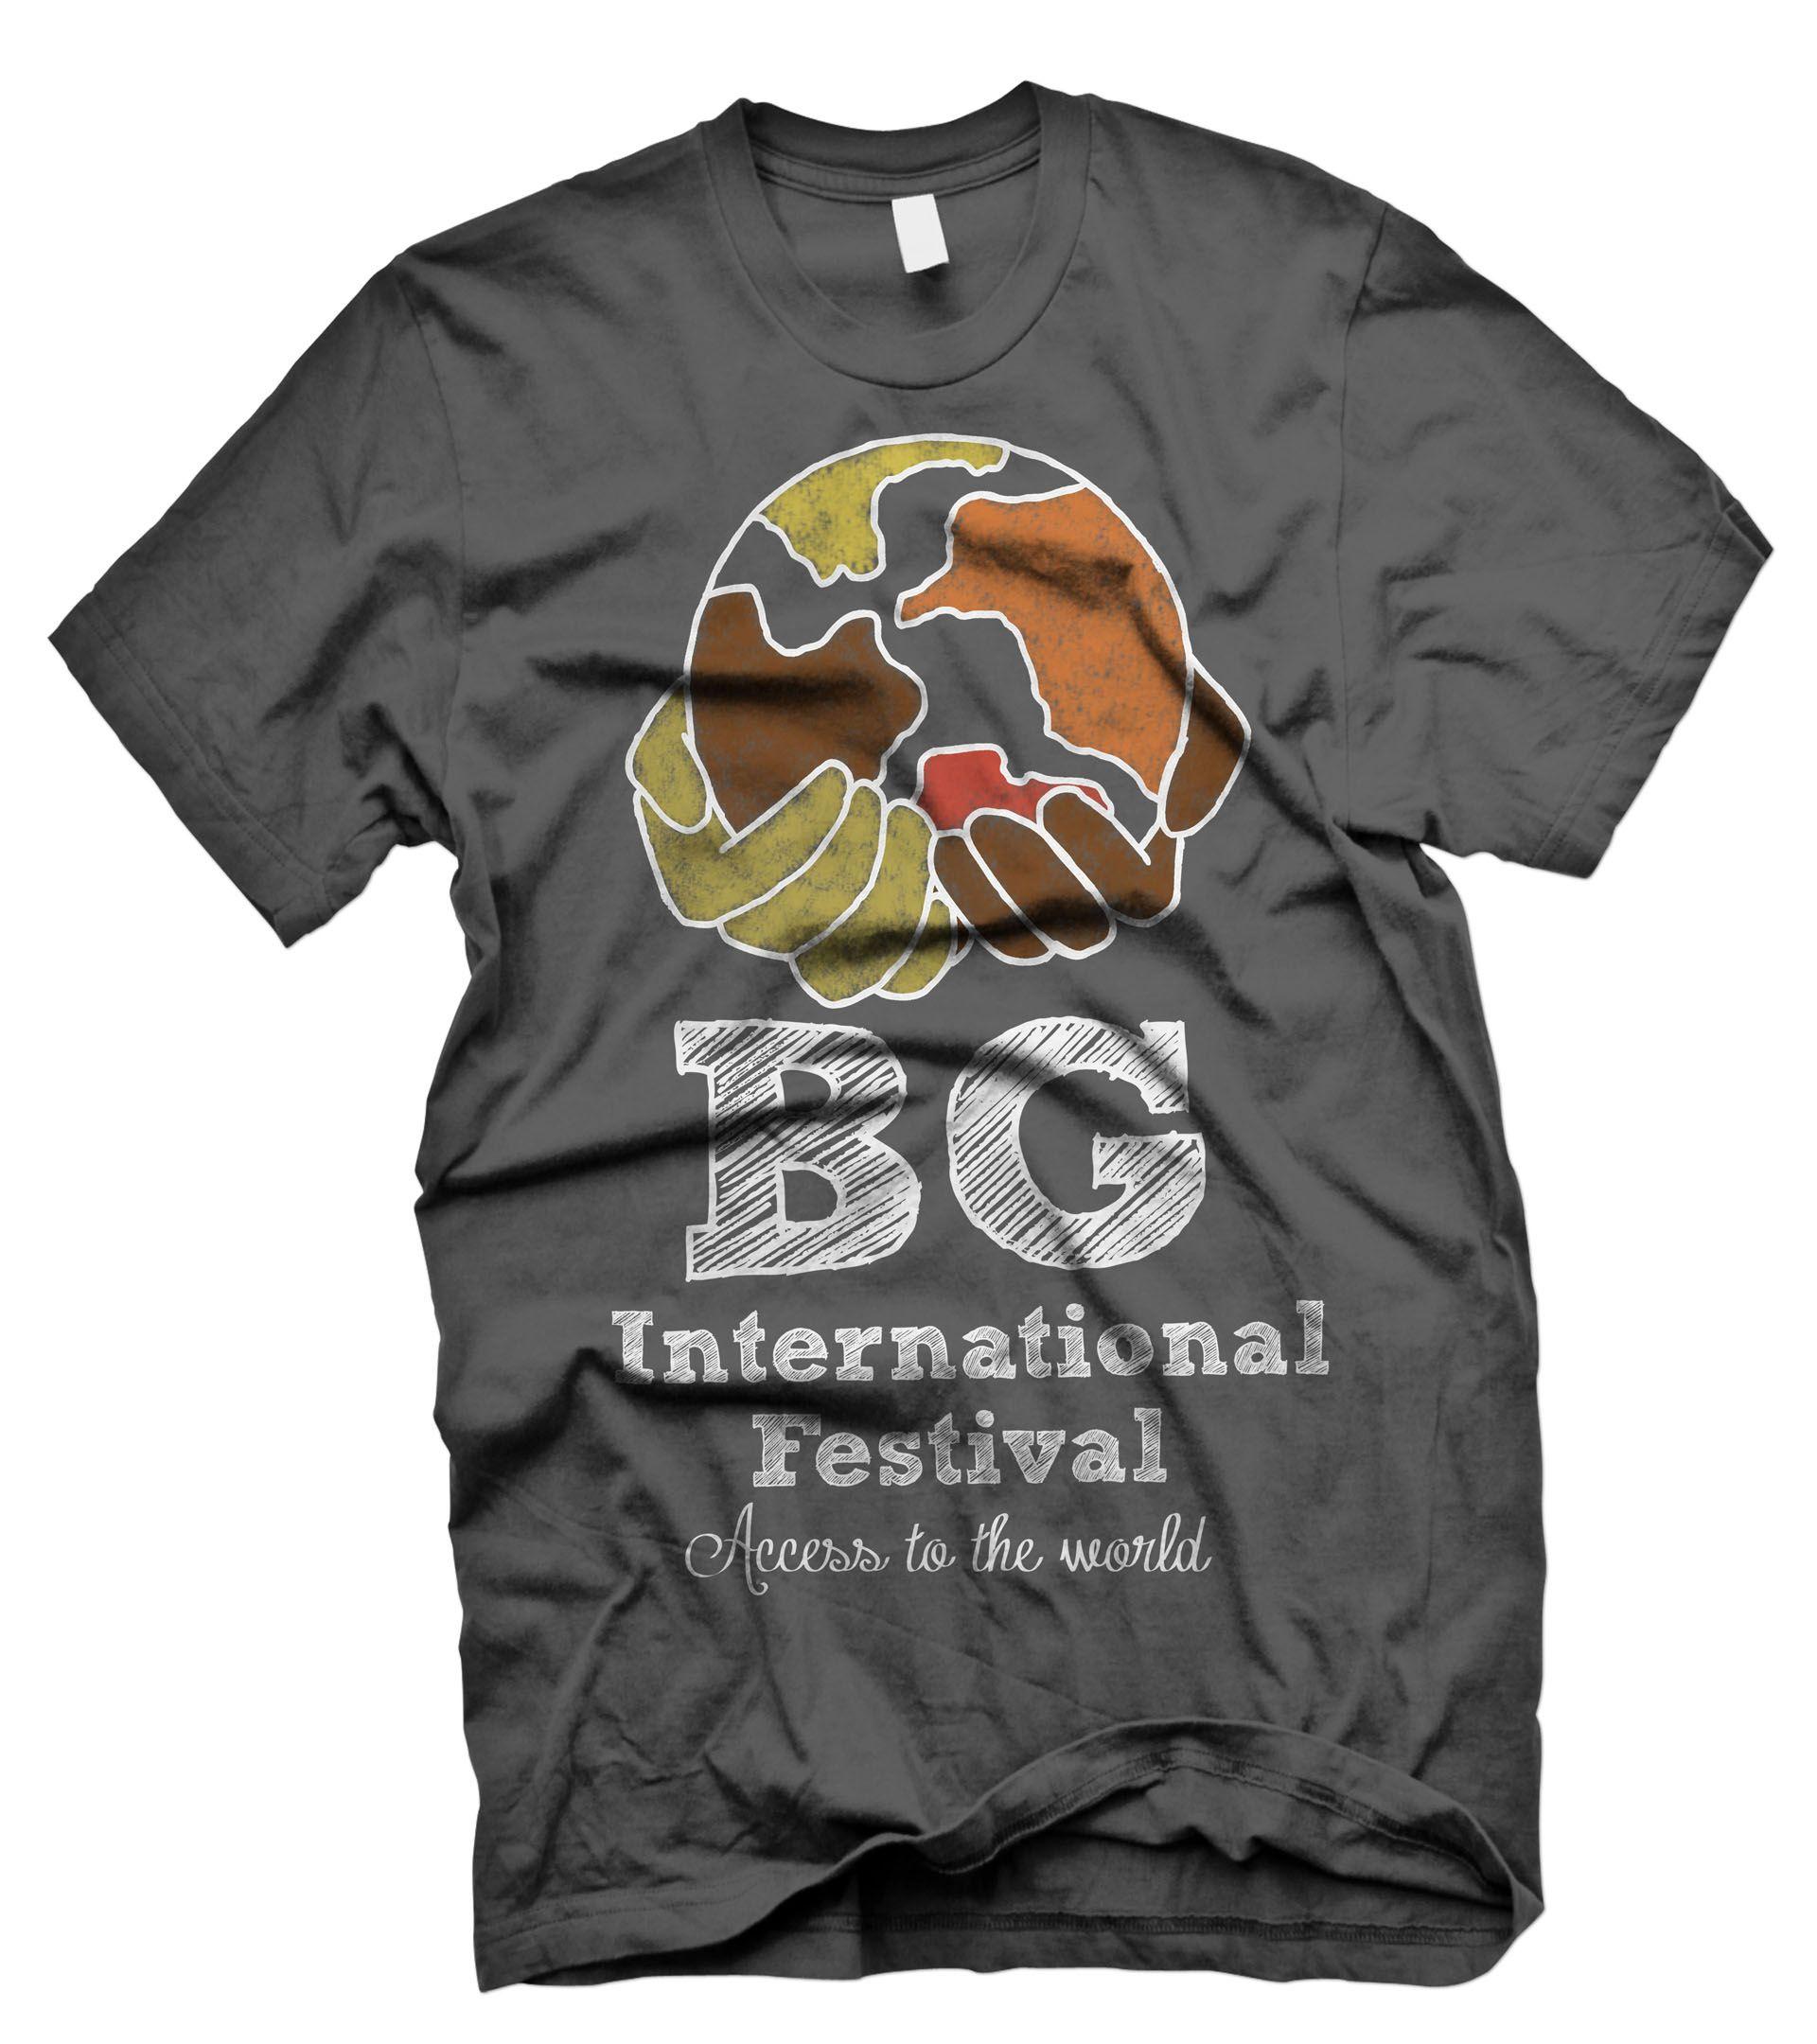 1e546634595383 t-shirt design for Bowling Green